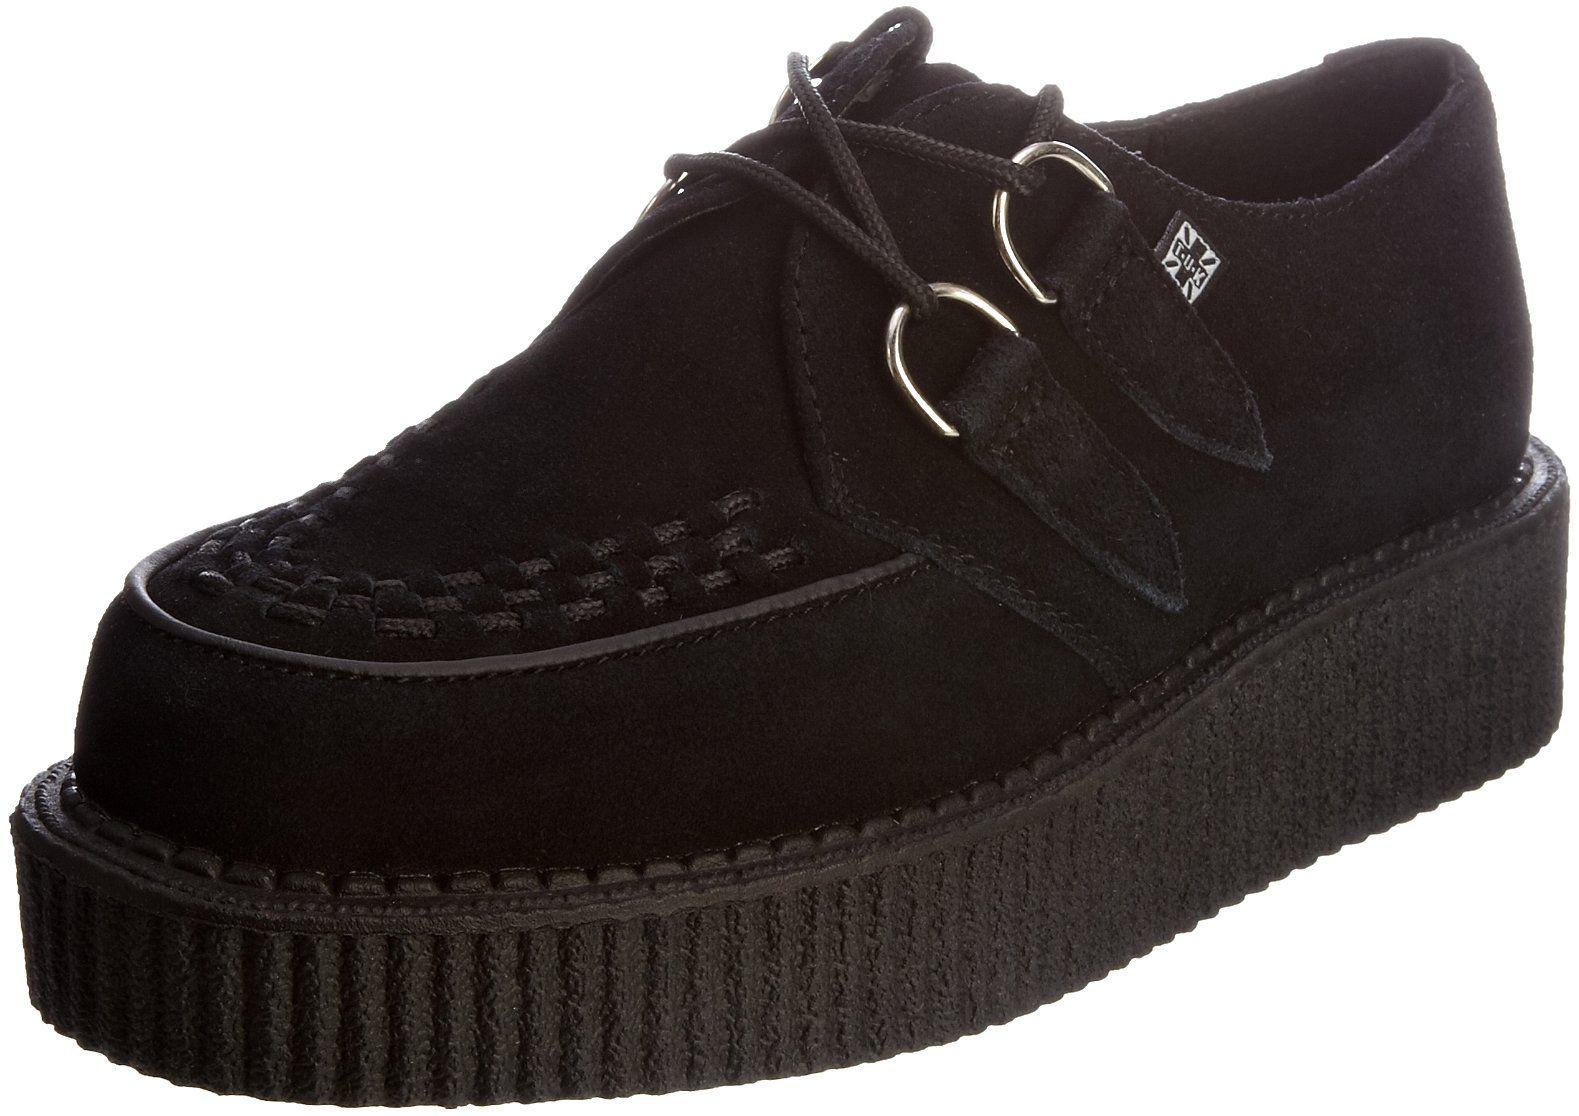 Viva Hi Sole Creeper, Sneakers Basses Mixte Adulte, Noir (Black), 44 EU (11 UK)T.U.K.